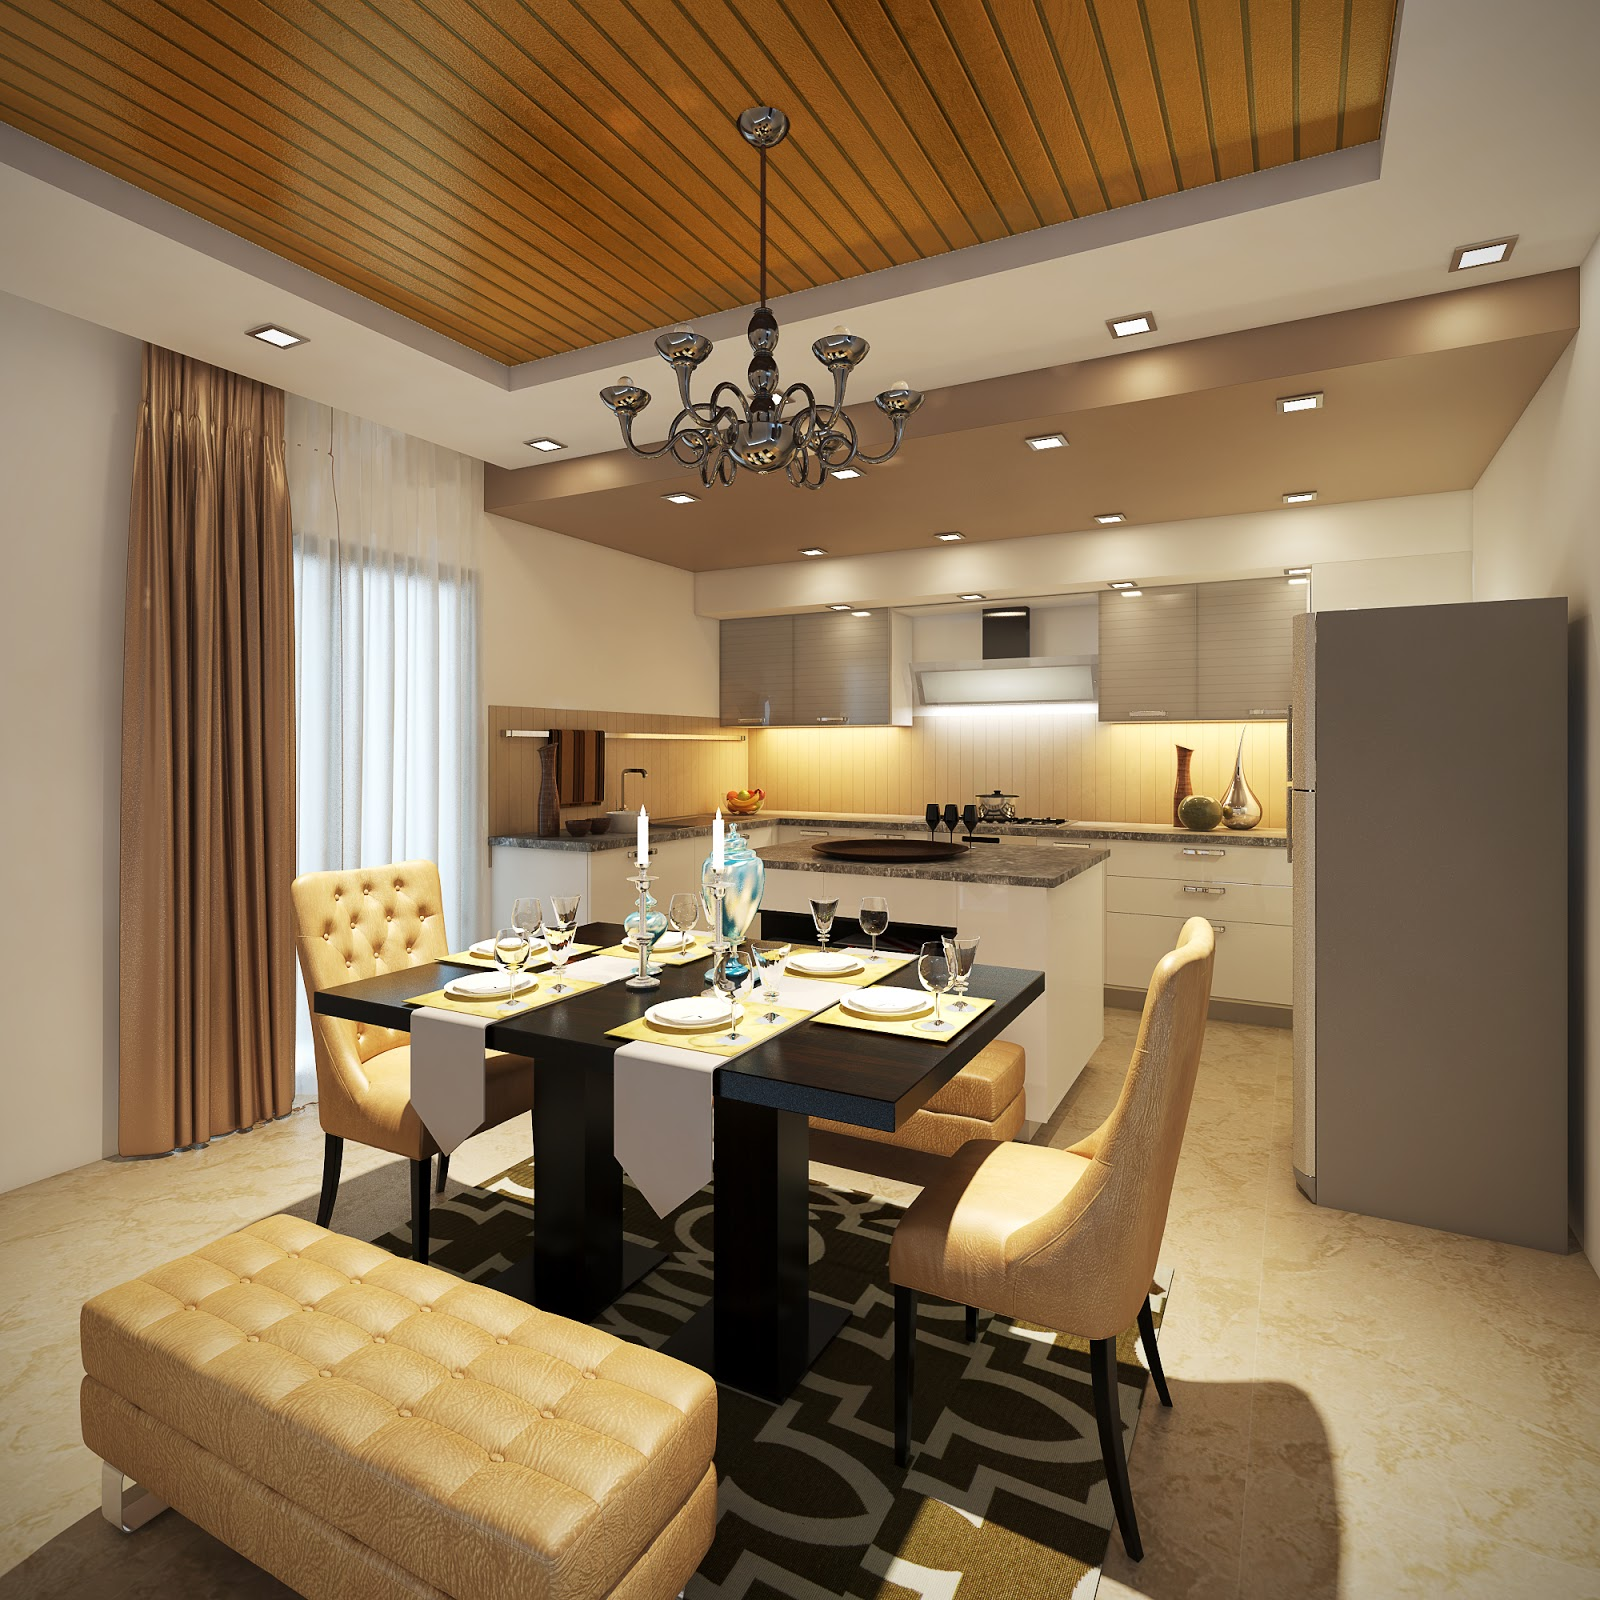 3d Max Kitchen Interior Design: 3D Designer Architect Interior / Exterior (3ds Max, Maya